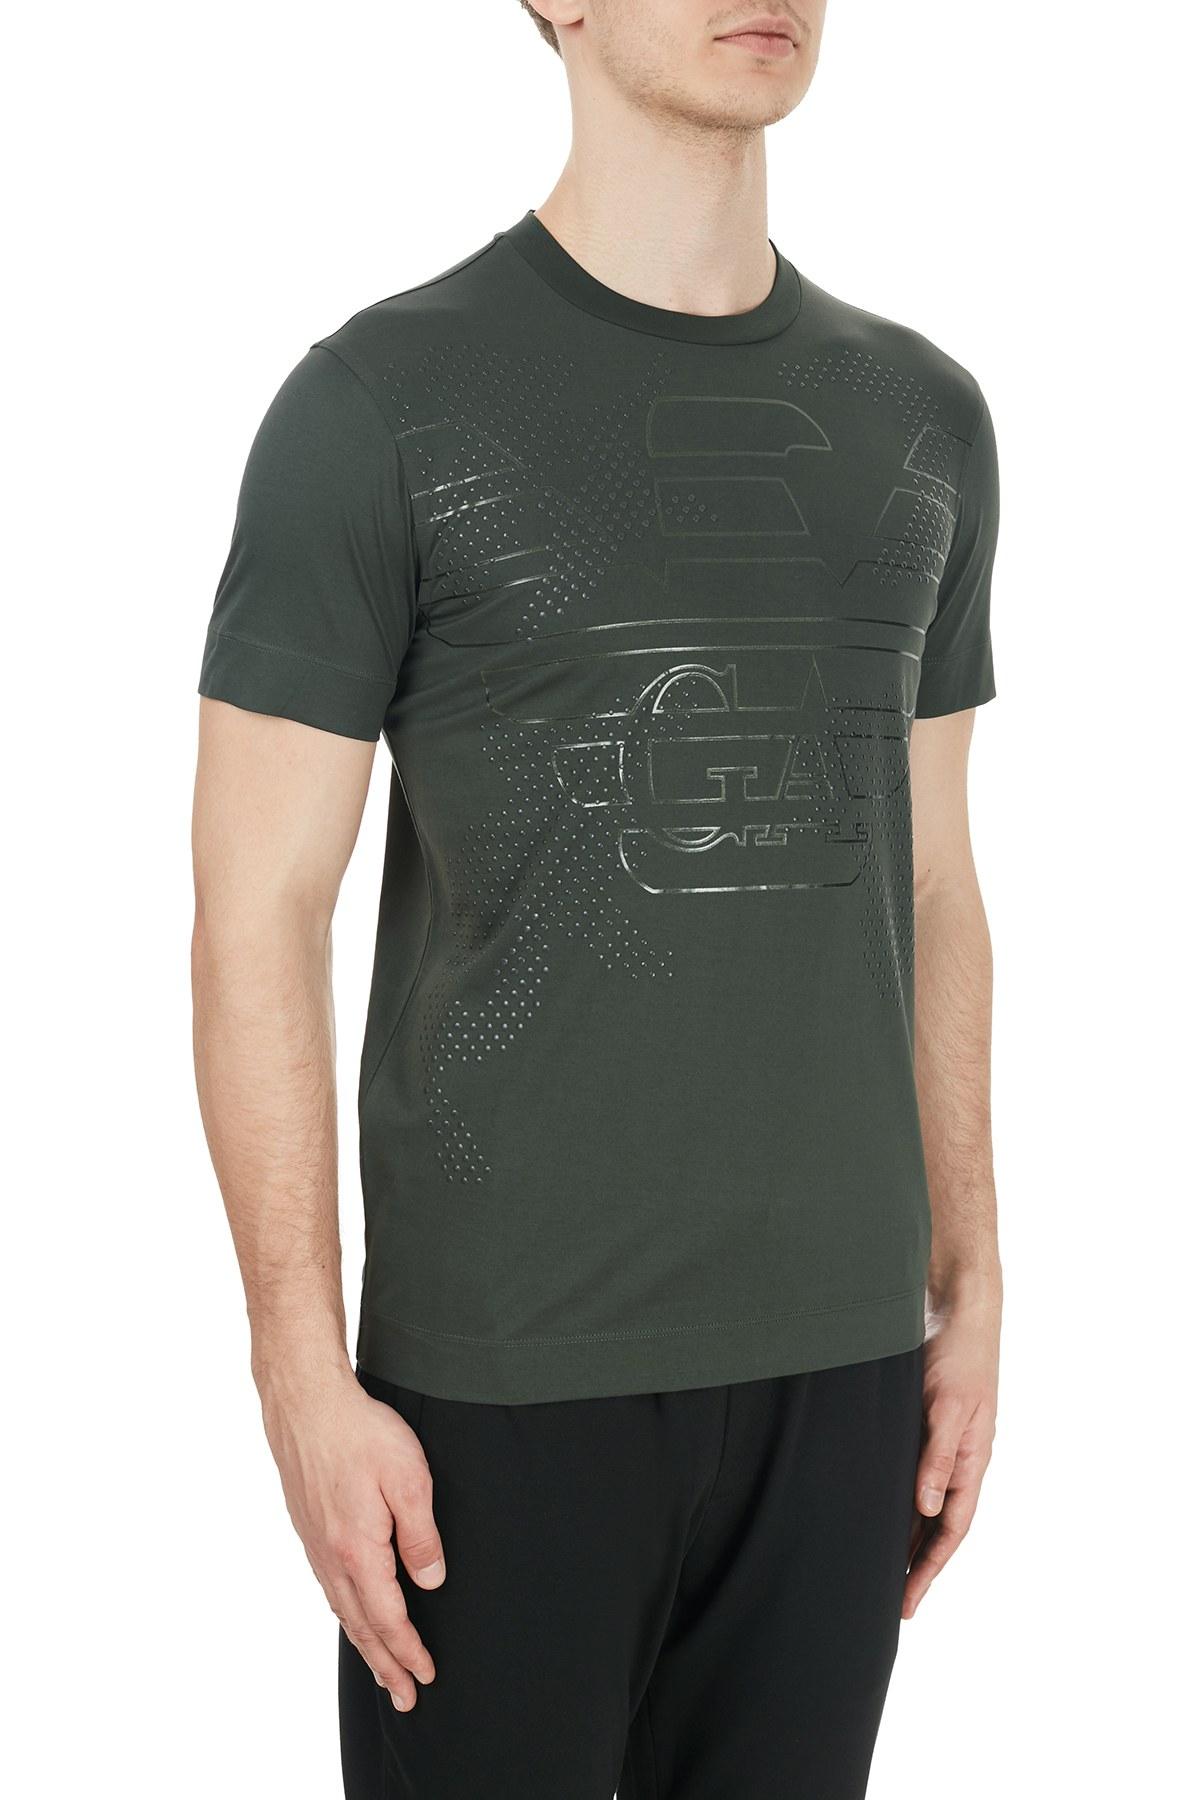 Emporio Armani Baskılı Bisiklet Yaka % 100 Pamuk Erkek T Shirt 6H1TG2 1JTUZ 0564 HAKİ